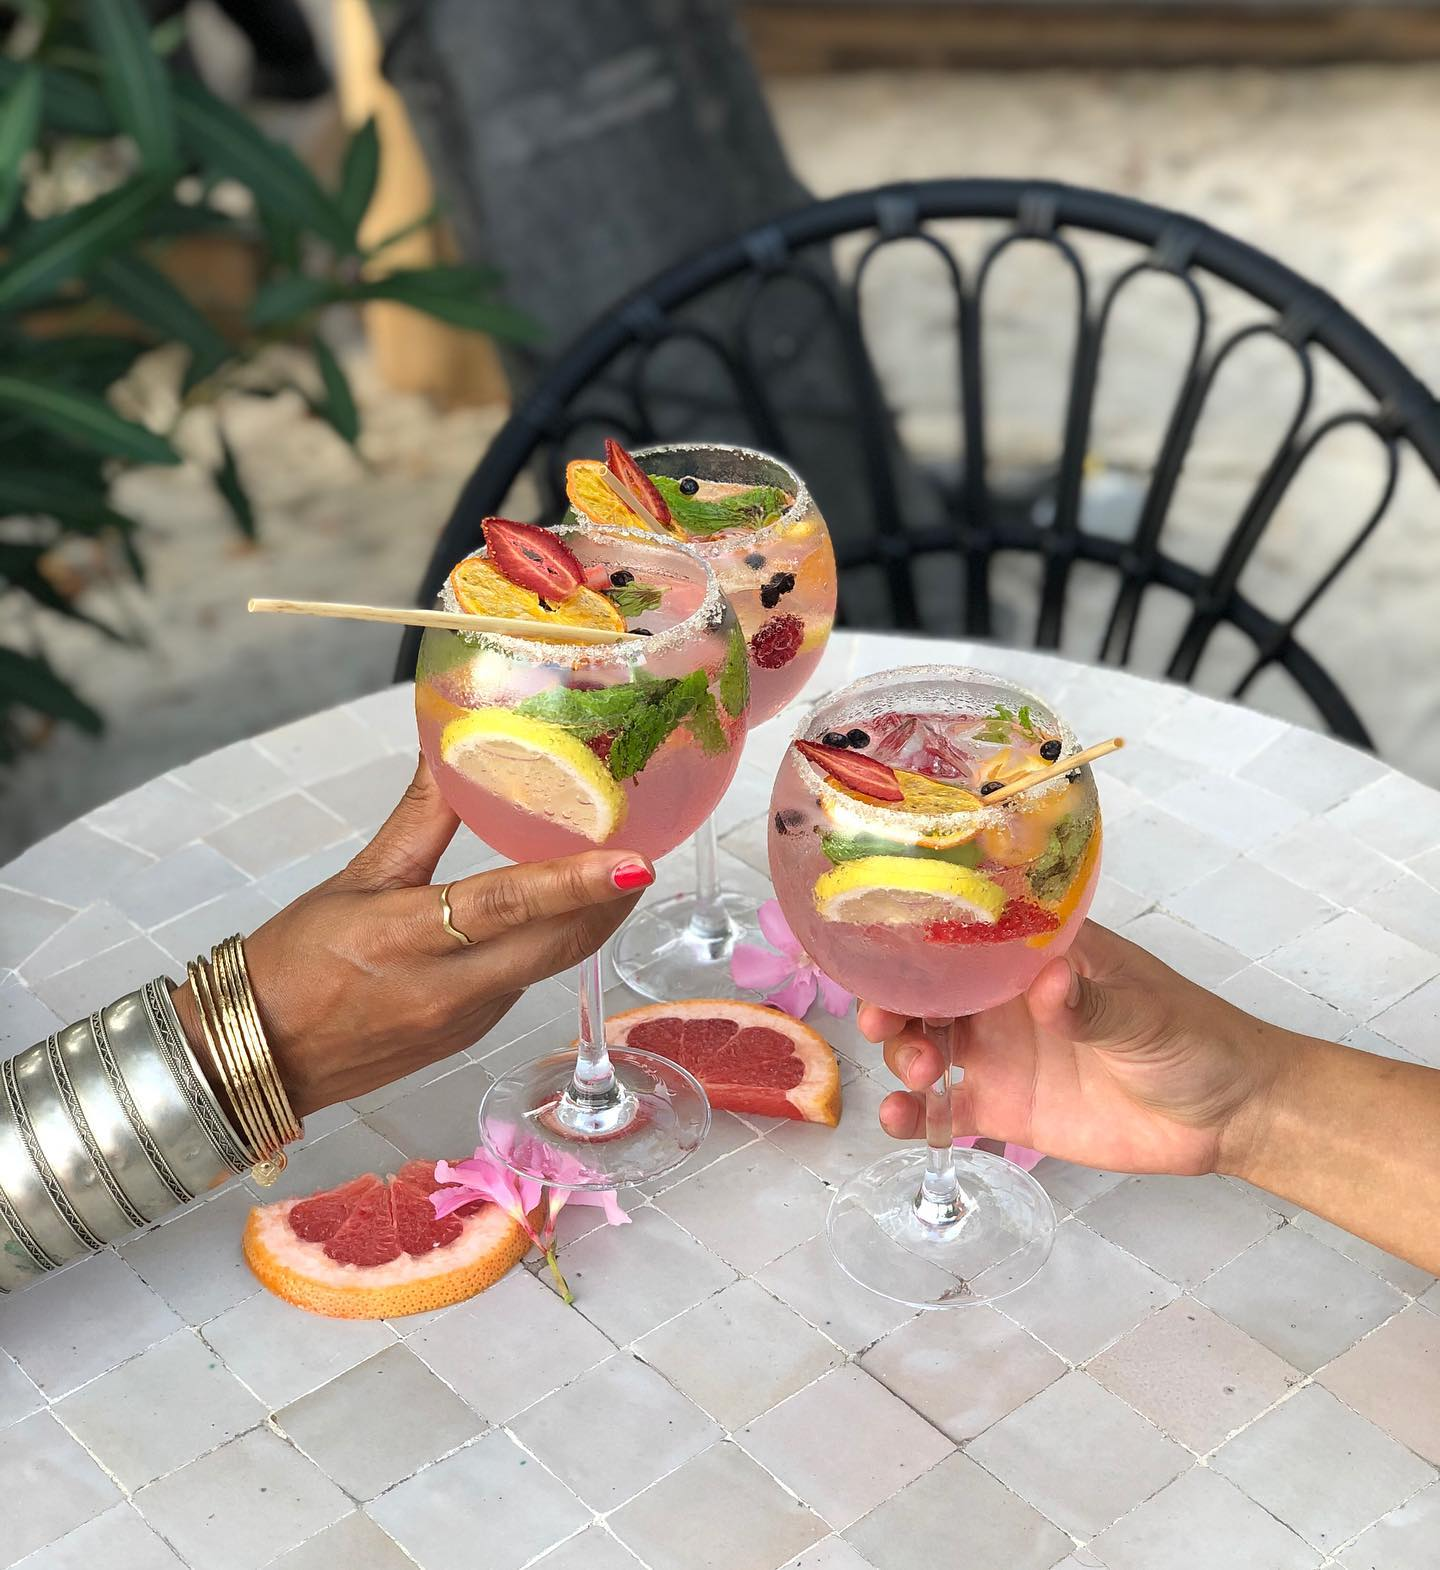 Thursday's call for a girls night out @villadjunah 🌺  #villadjunah #bliss #antibescotedazur #juanlespins #frenchriviera #enjoy #chill #happyhour #girlsnight